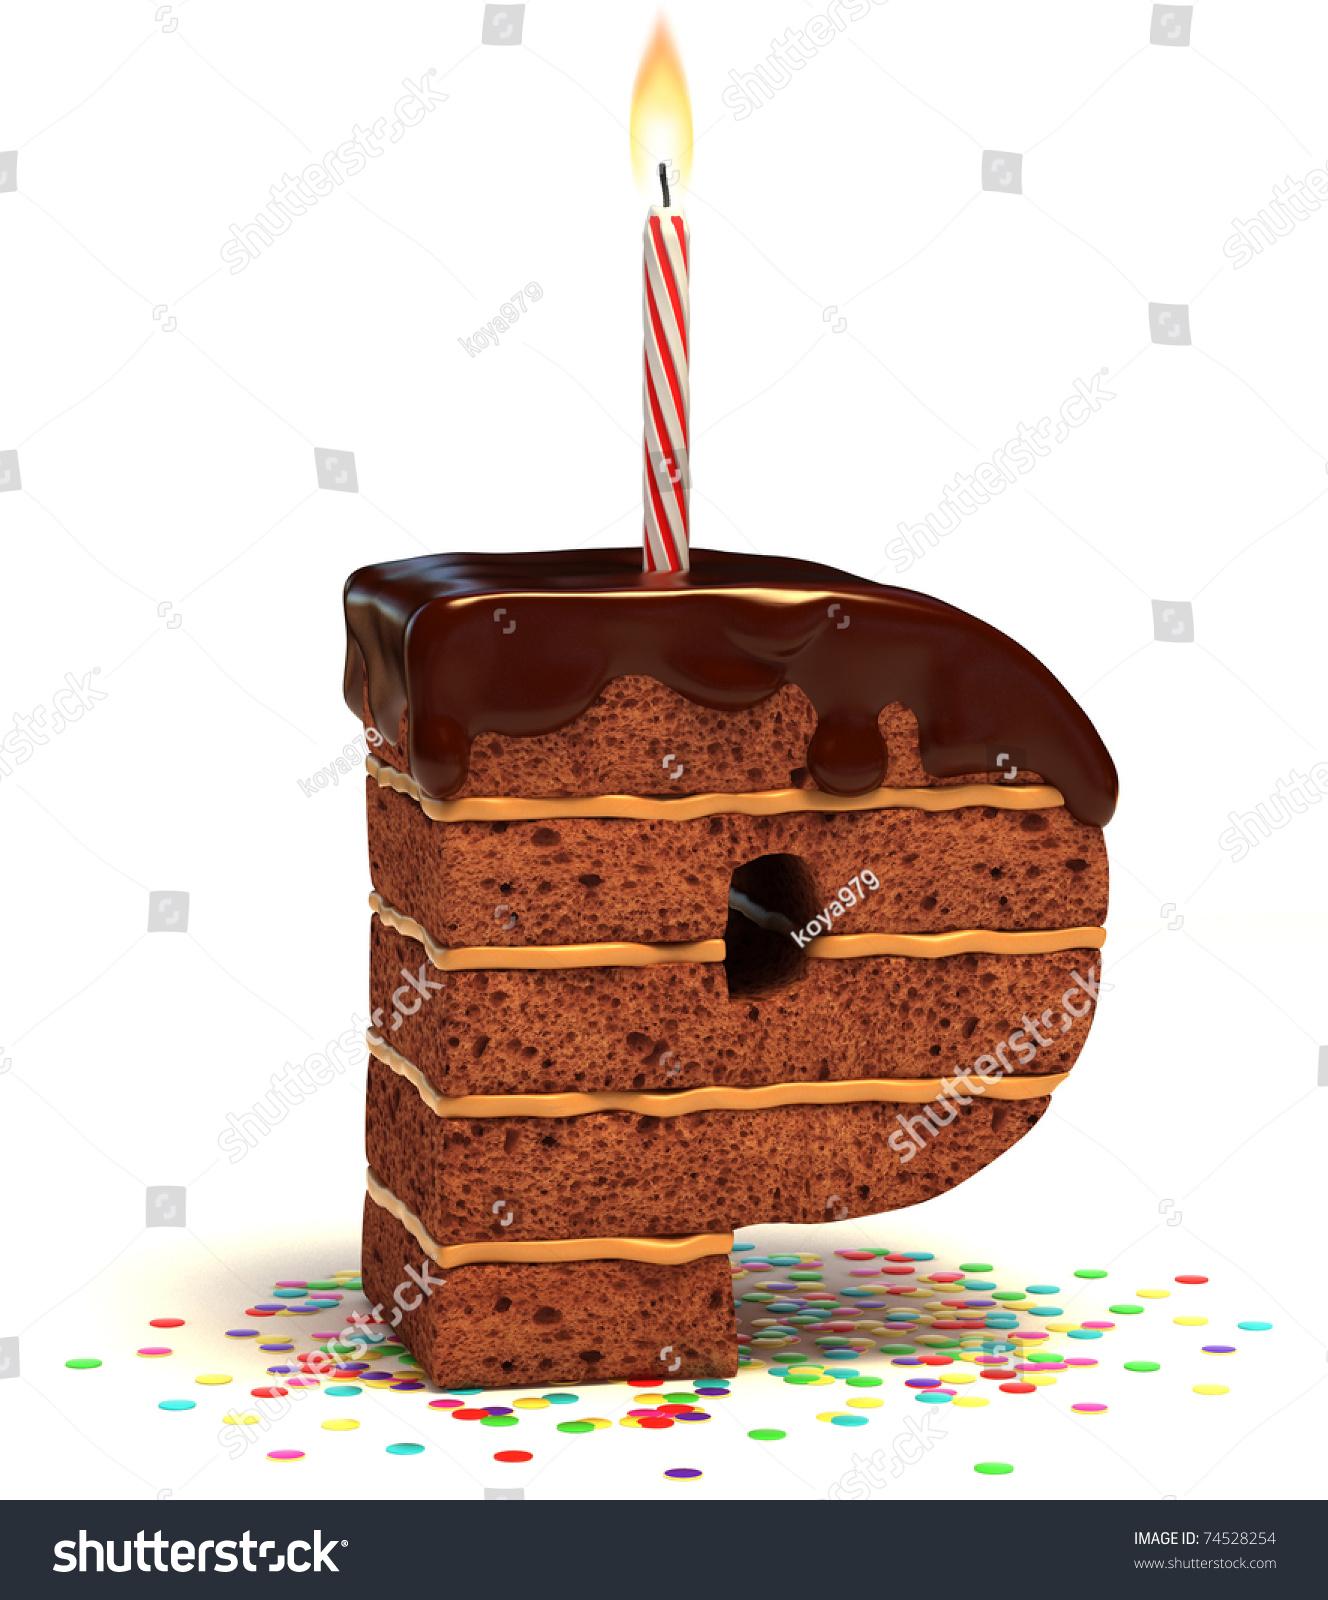 Letter P Shaped Chocolate Birthday Cake Stock Illustration 74528254 - Shutterstock